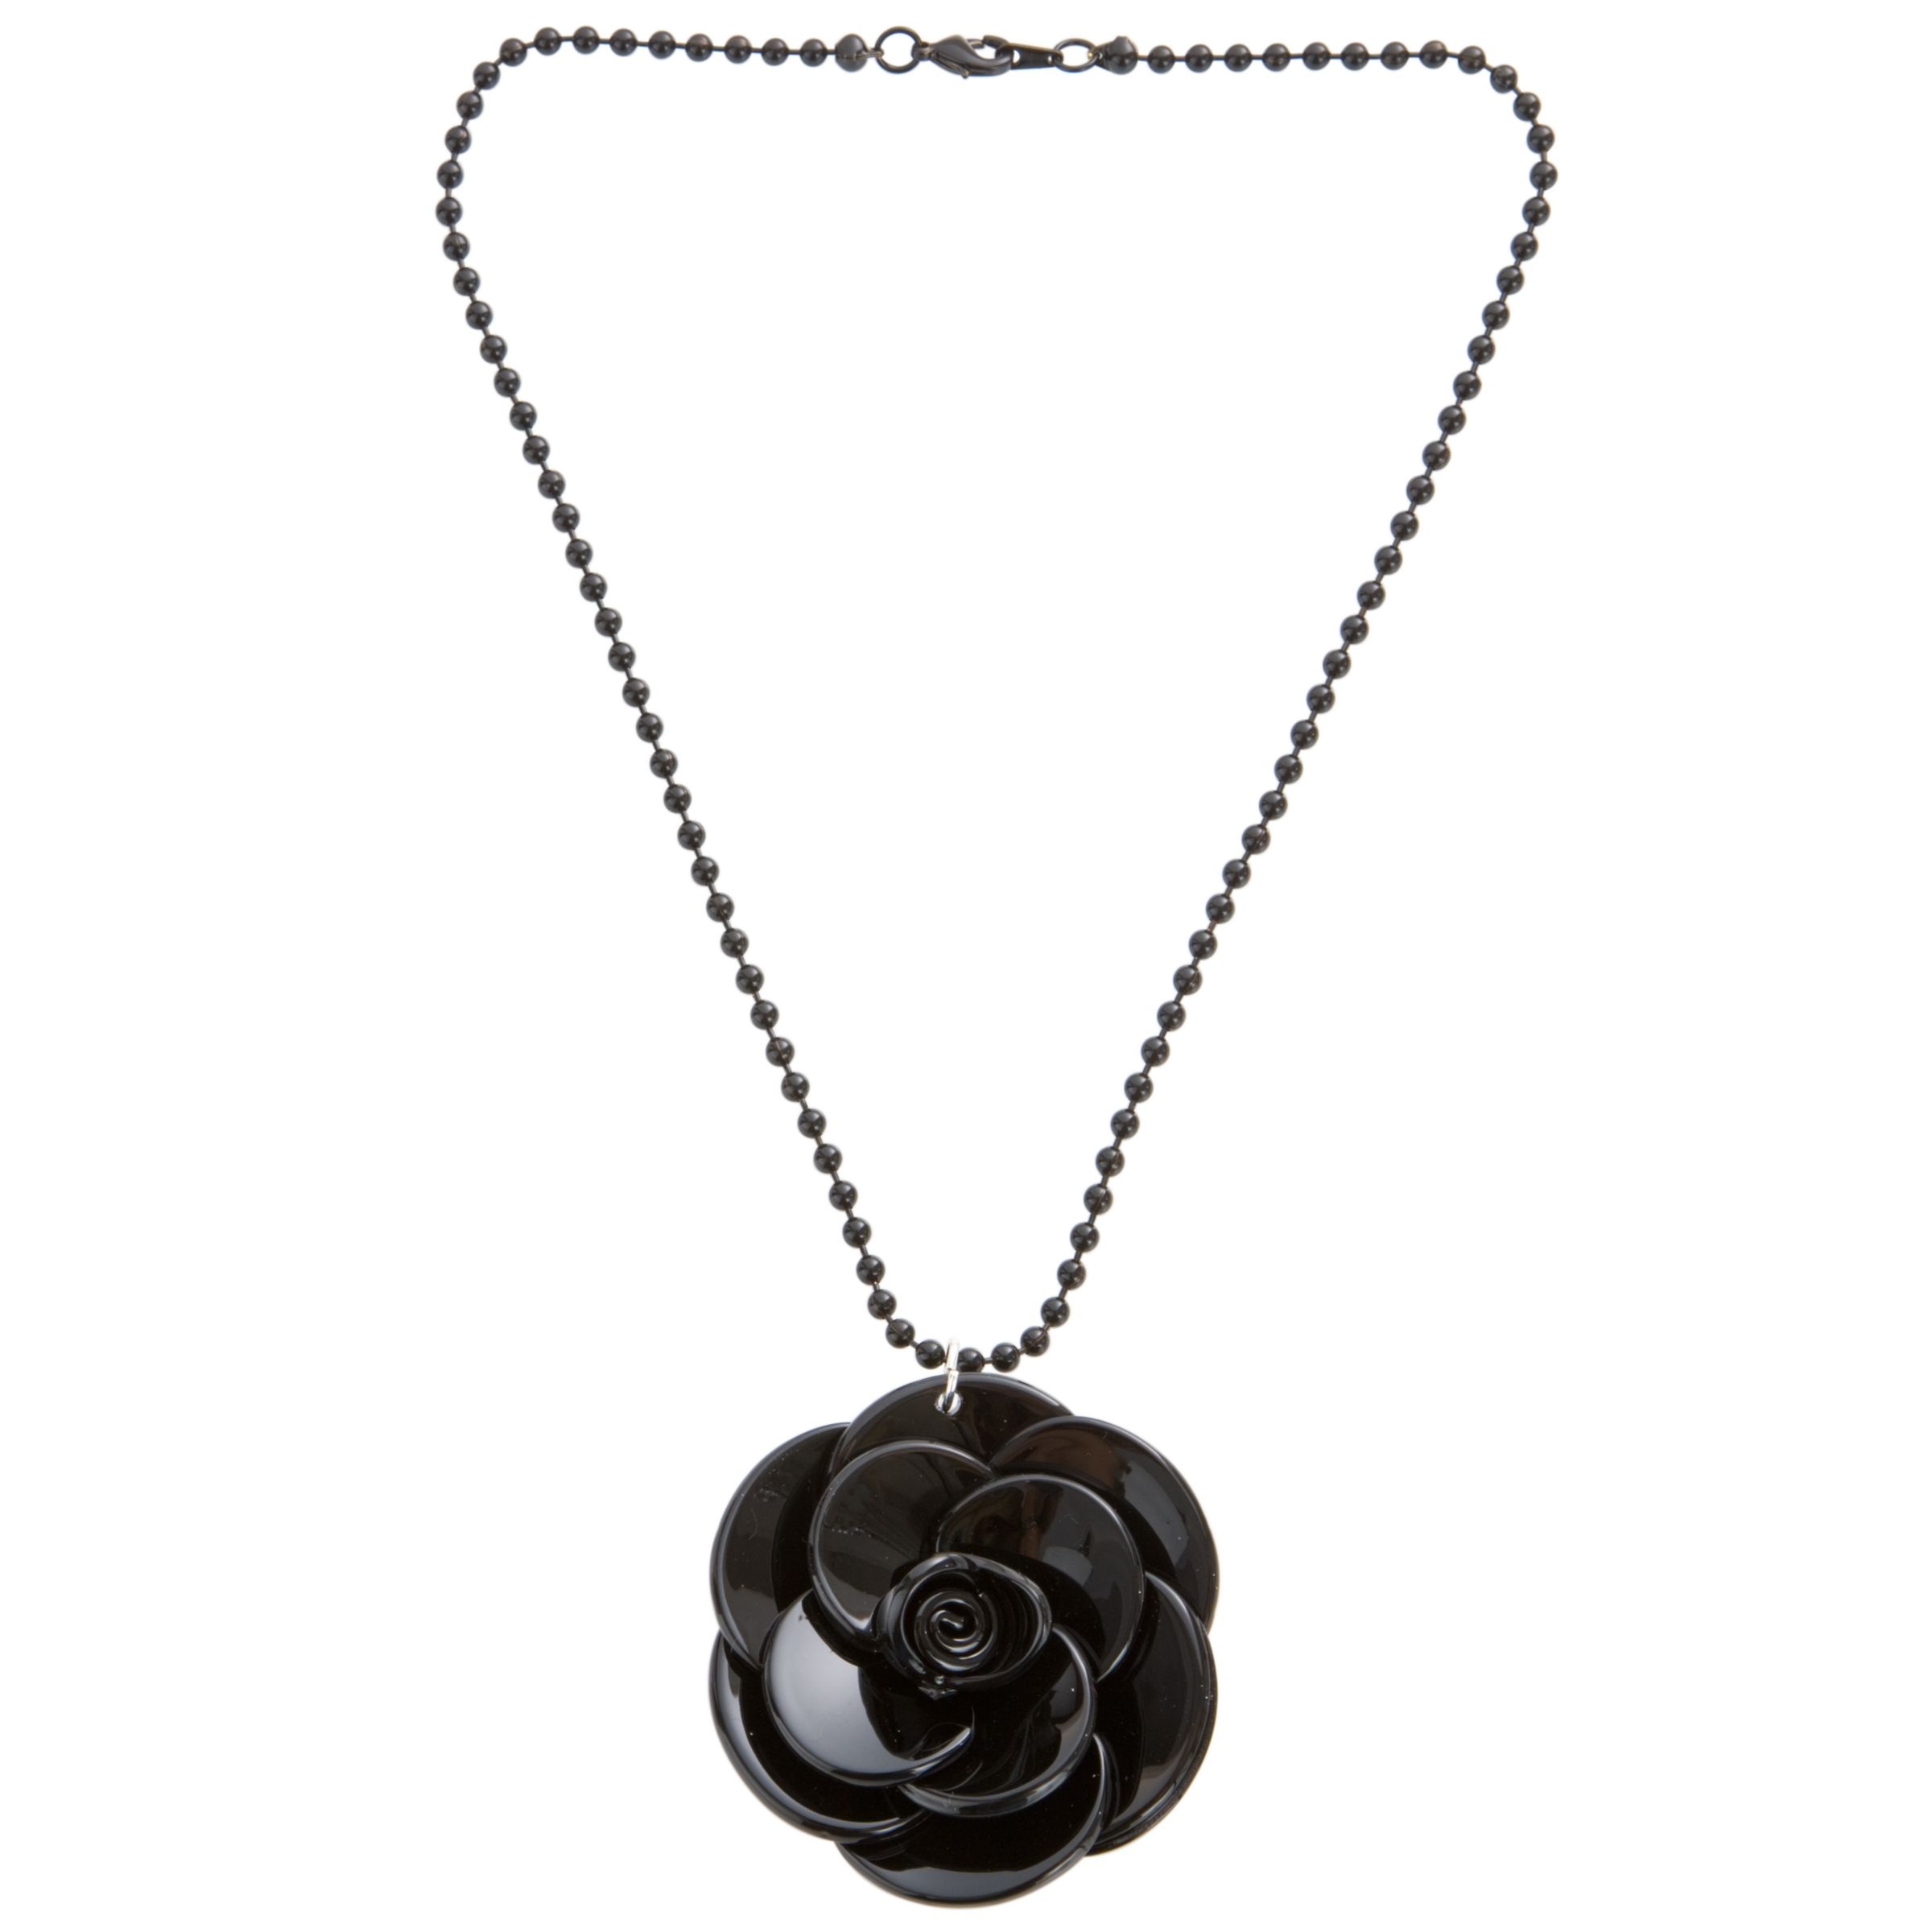 Big Baby Large Rosette Black Flower Pendant Necklace